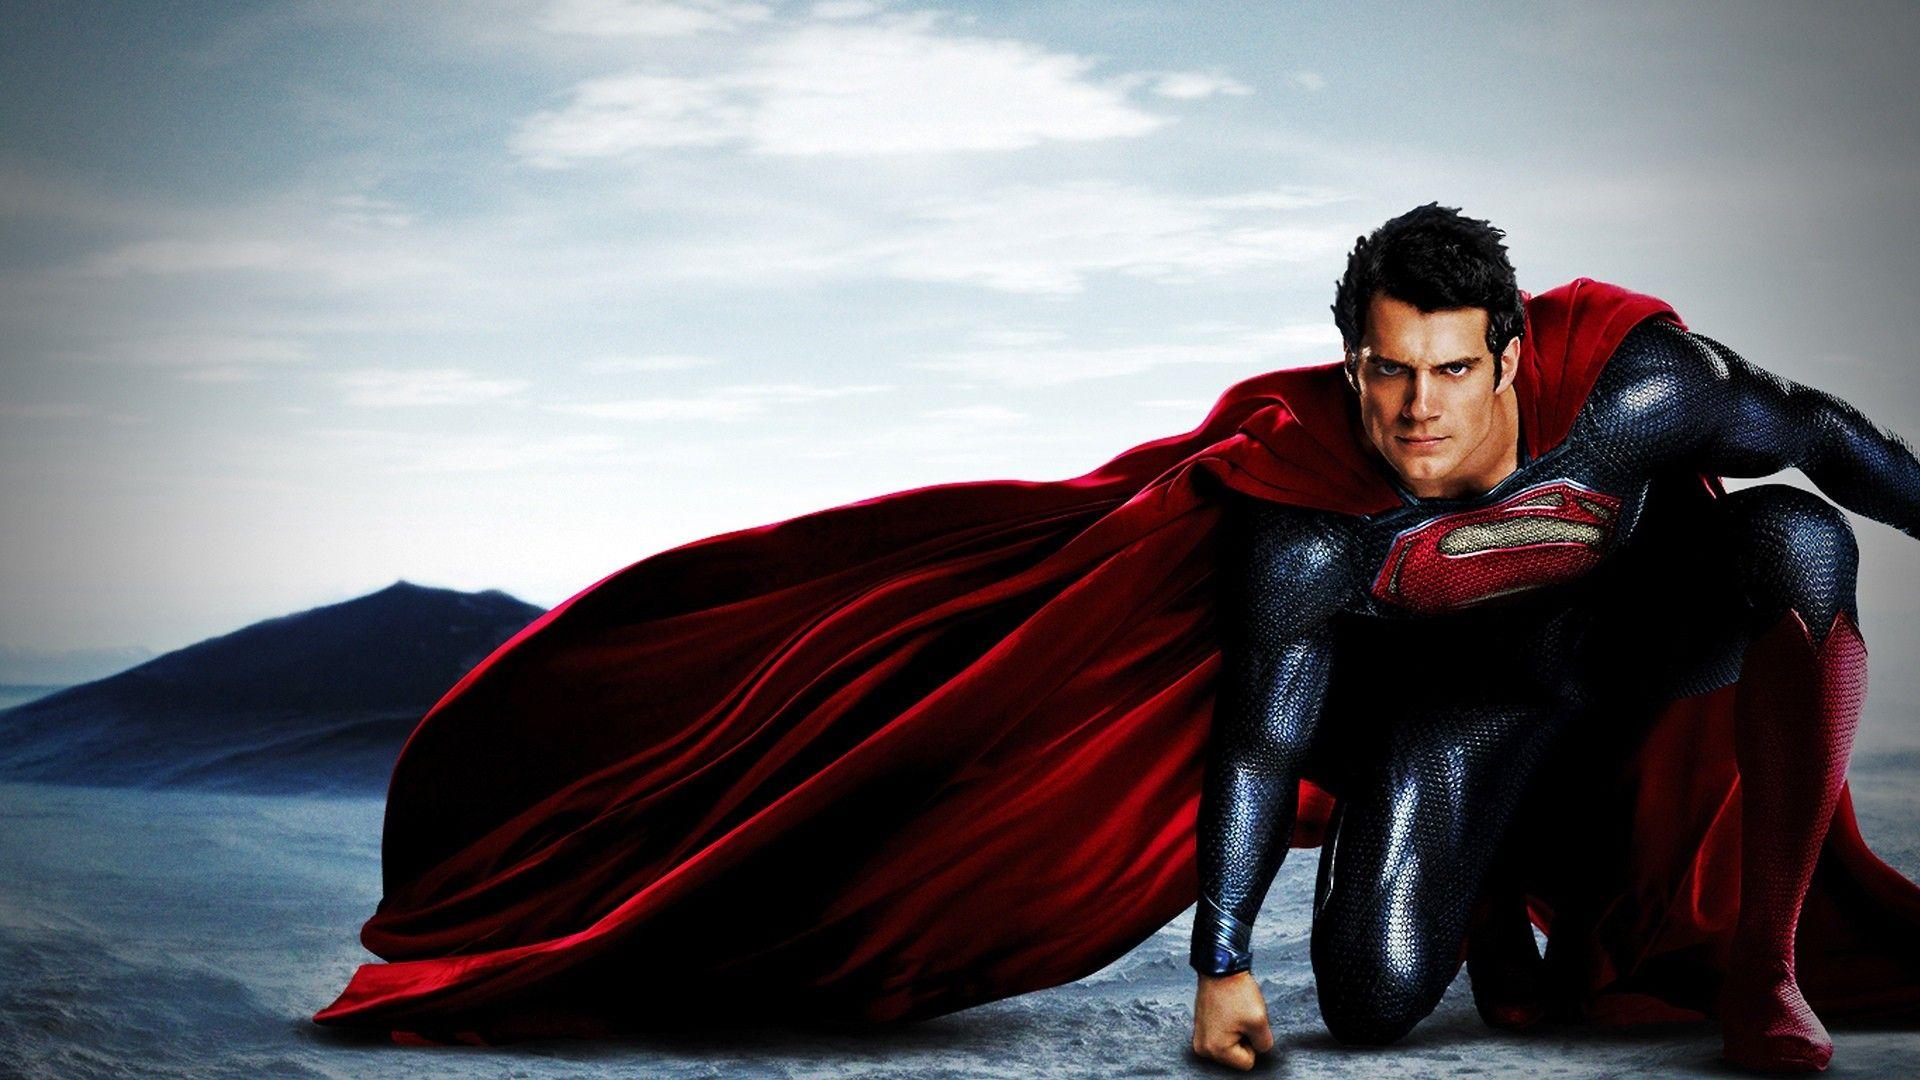 Hd wallpaper superman - Superman Hd Wallpapers 1080p